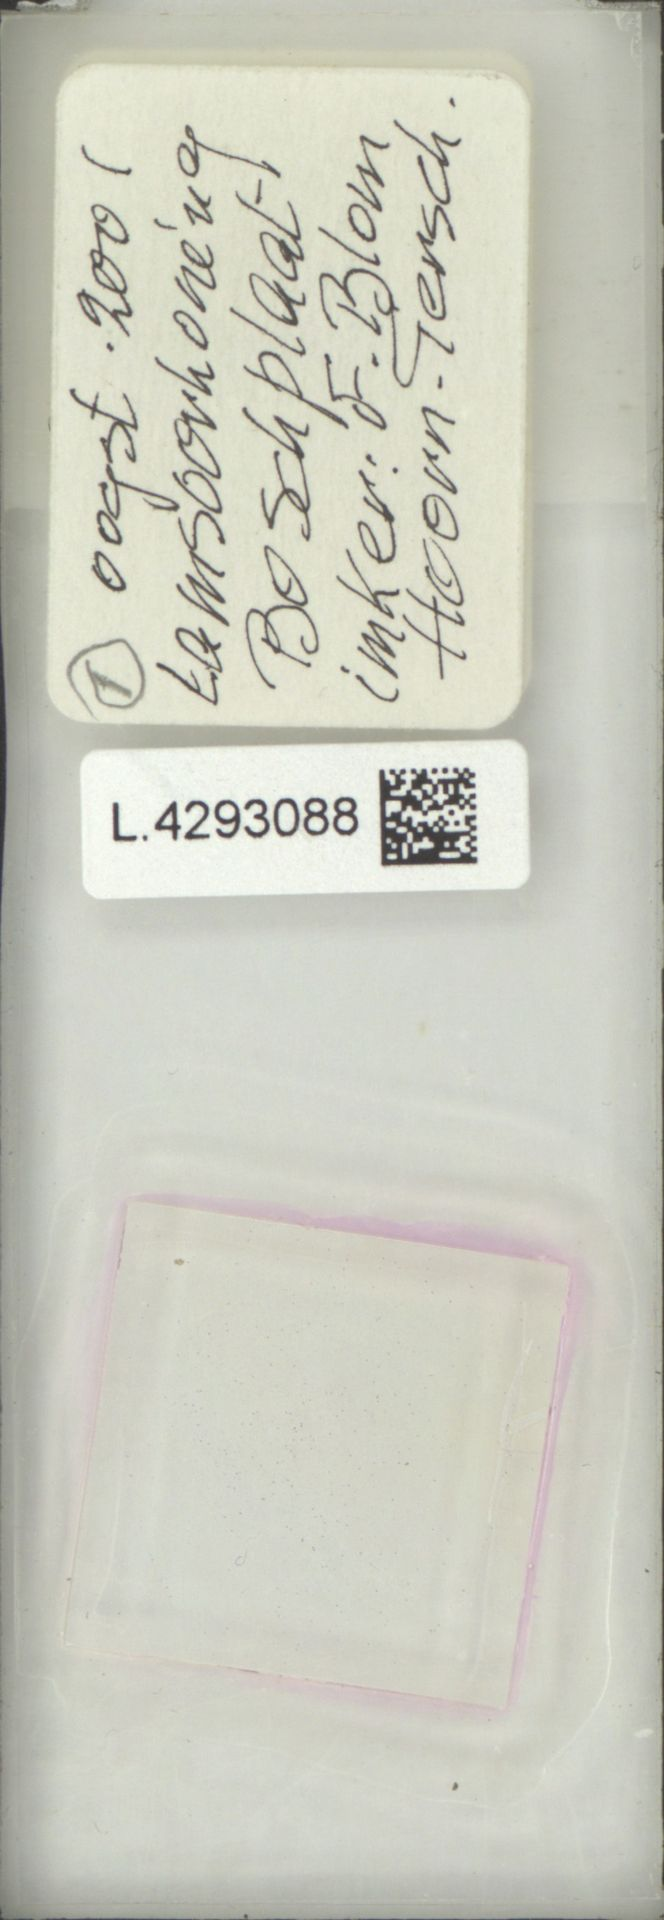 L.4293088 | Limonium vulgare Mill.